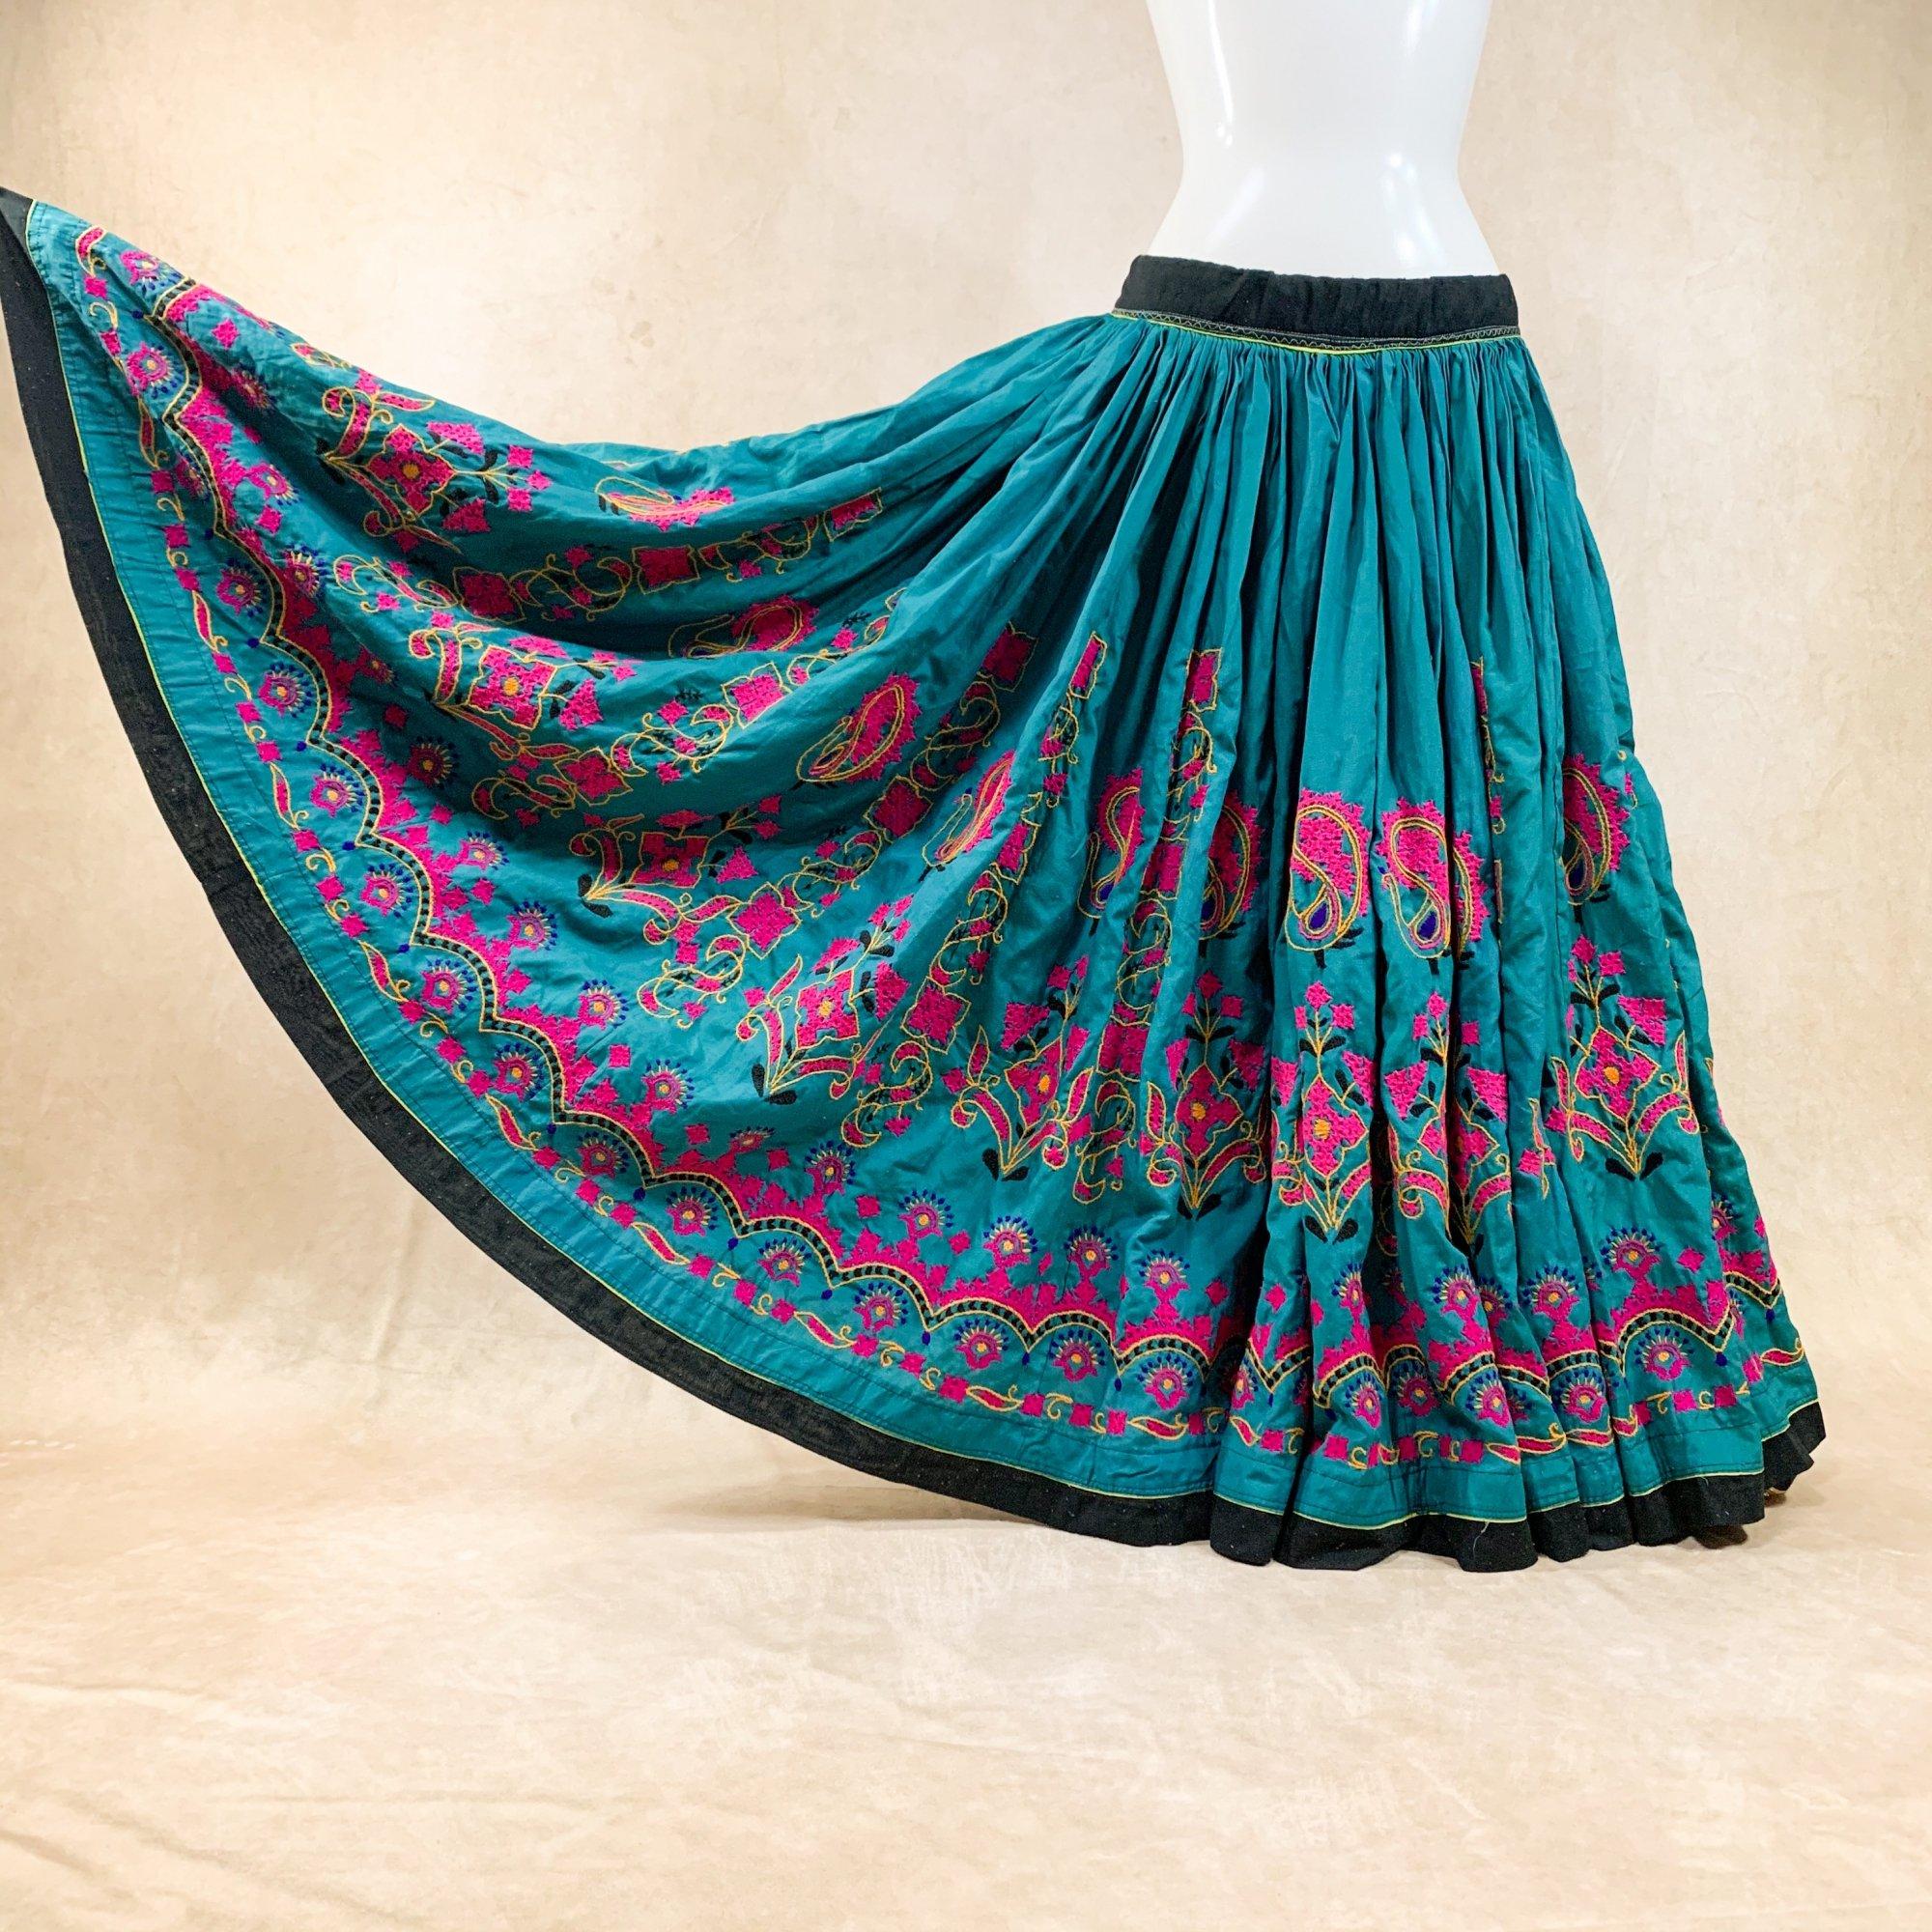 <img class='new_mark_img1' src='https://img.shop-pro.jp/img/new/icons61.gif' style='border:none;display:inline;margin:0px;padding:0px;width:auto;' />Kutch Gypsy skirt #78 *vintage* カッチ刺繍スカート ≪PEAKOCK≫